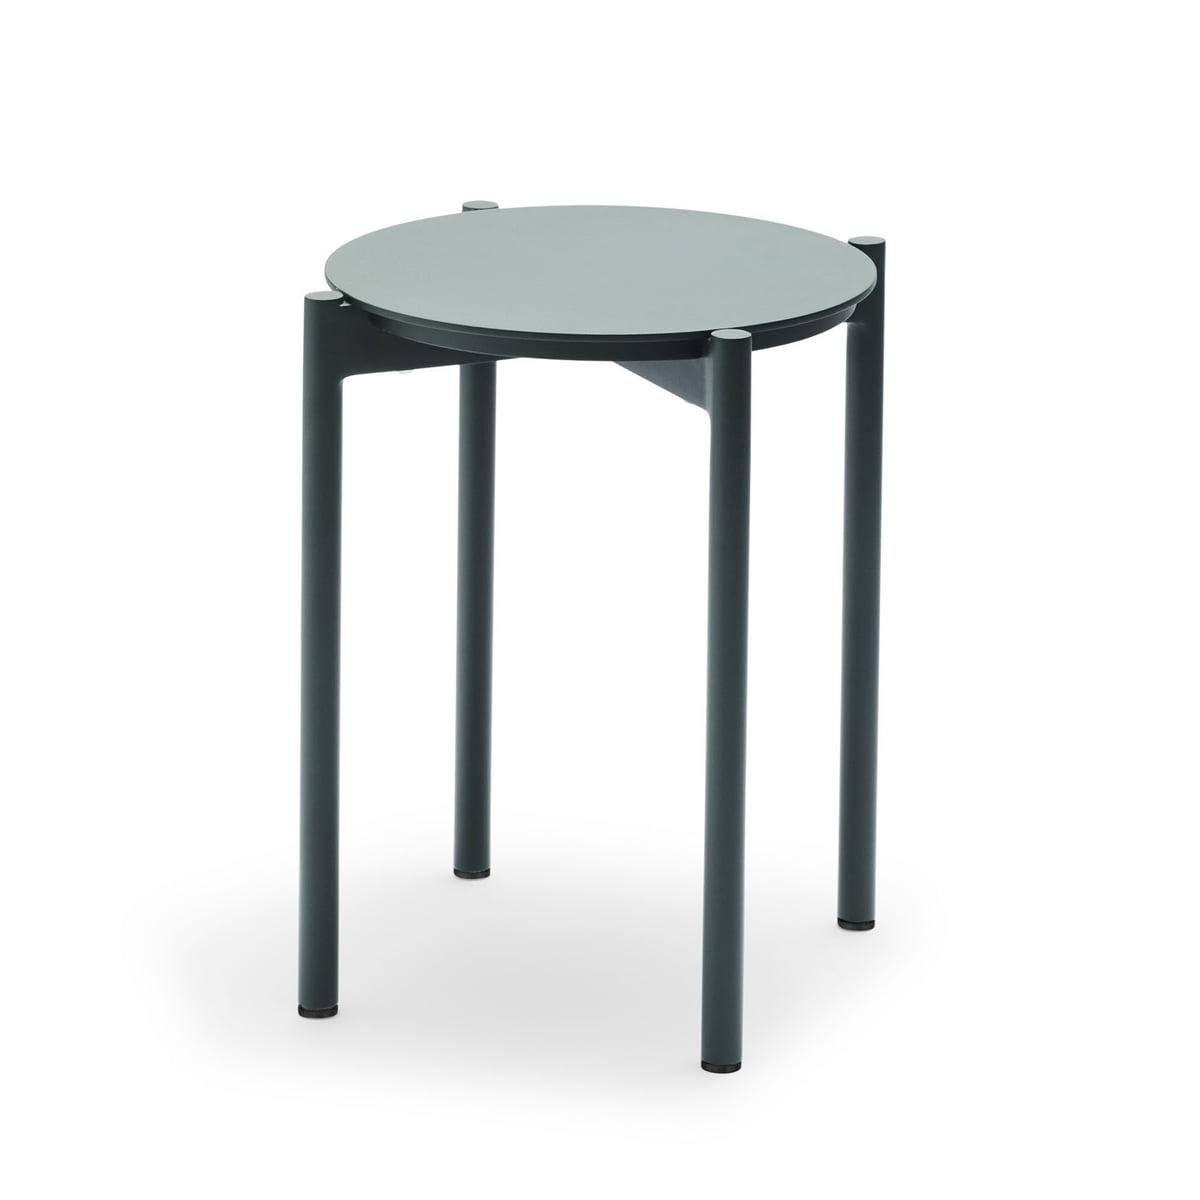 Outdoor Hocker picnic stool by skagerak connox